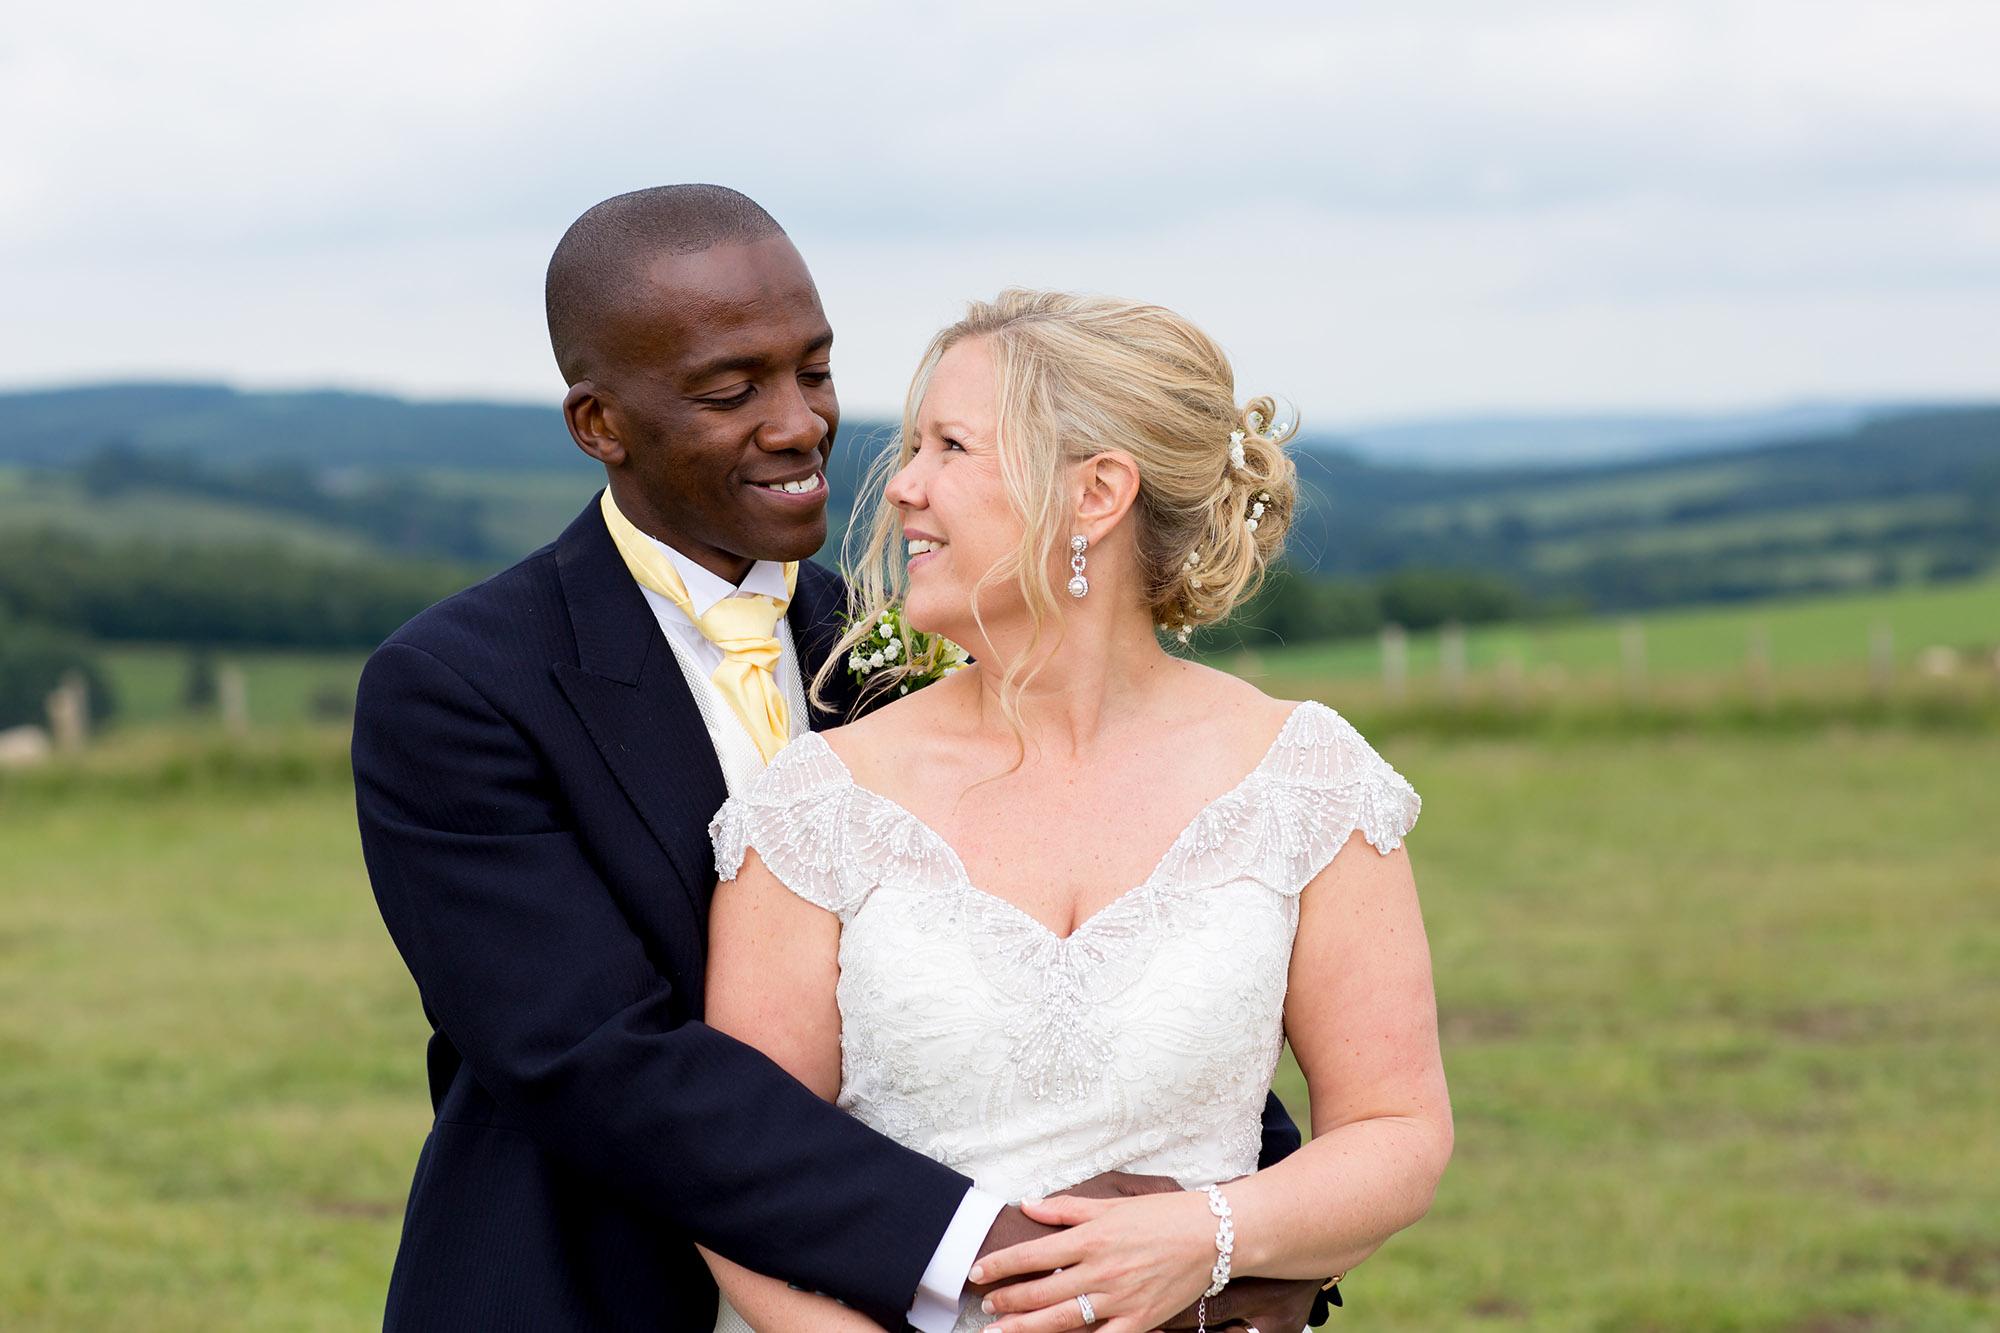 julia-toms-wedding-photographer-west-sussex-009.jpg